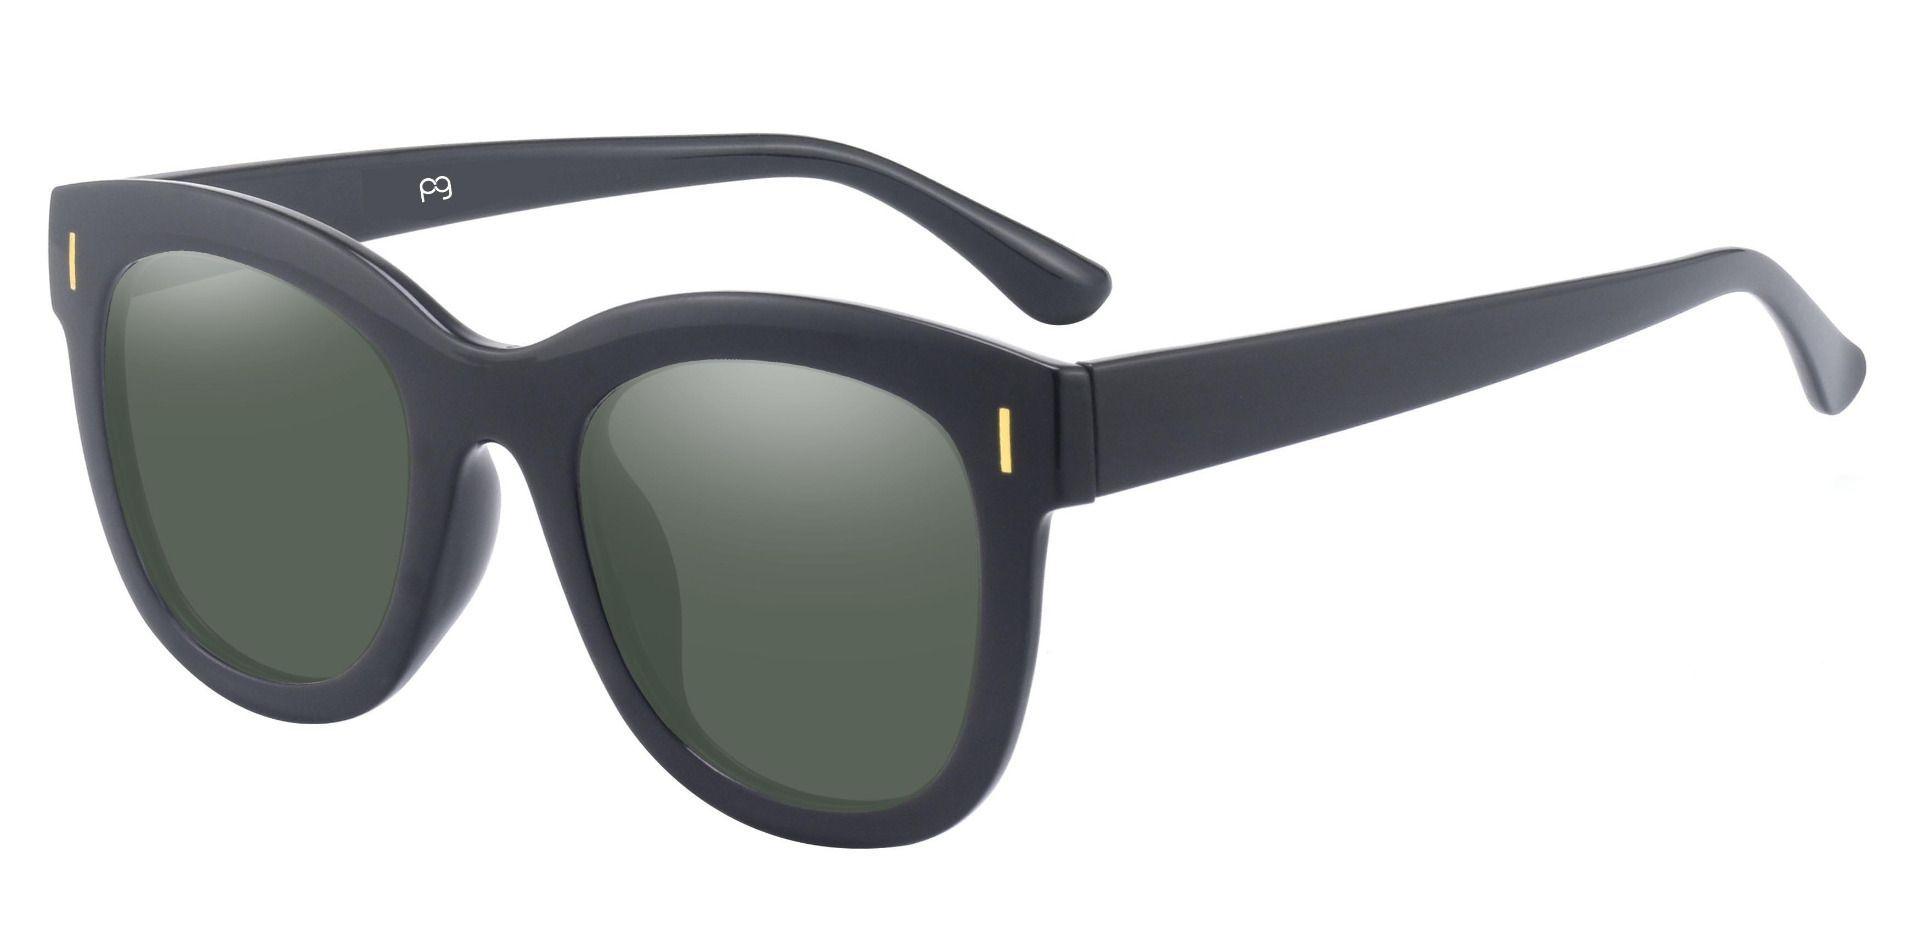 Saratoga Square Lined Bifocal Sunglasses - Black Frame With Green Lenses